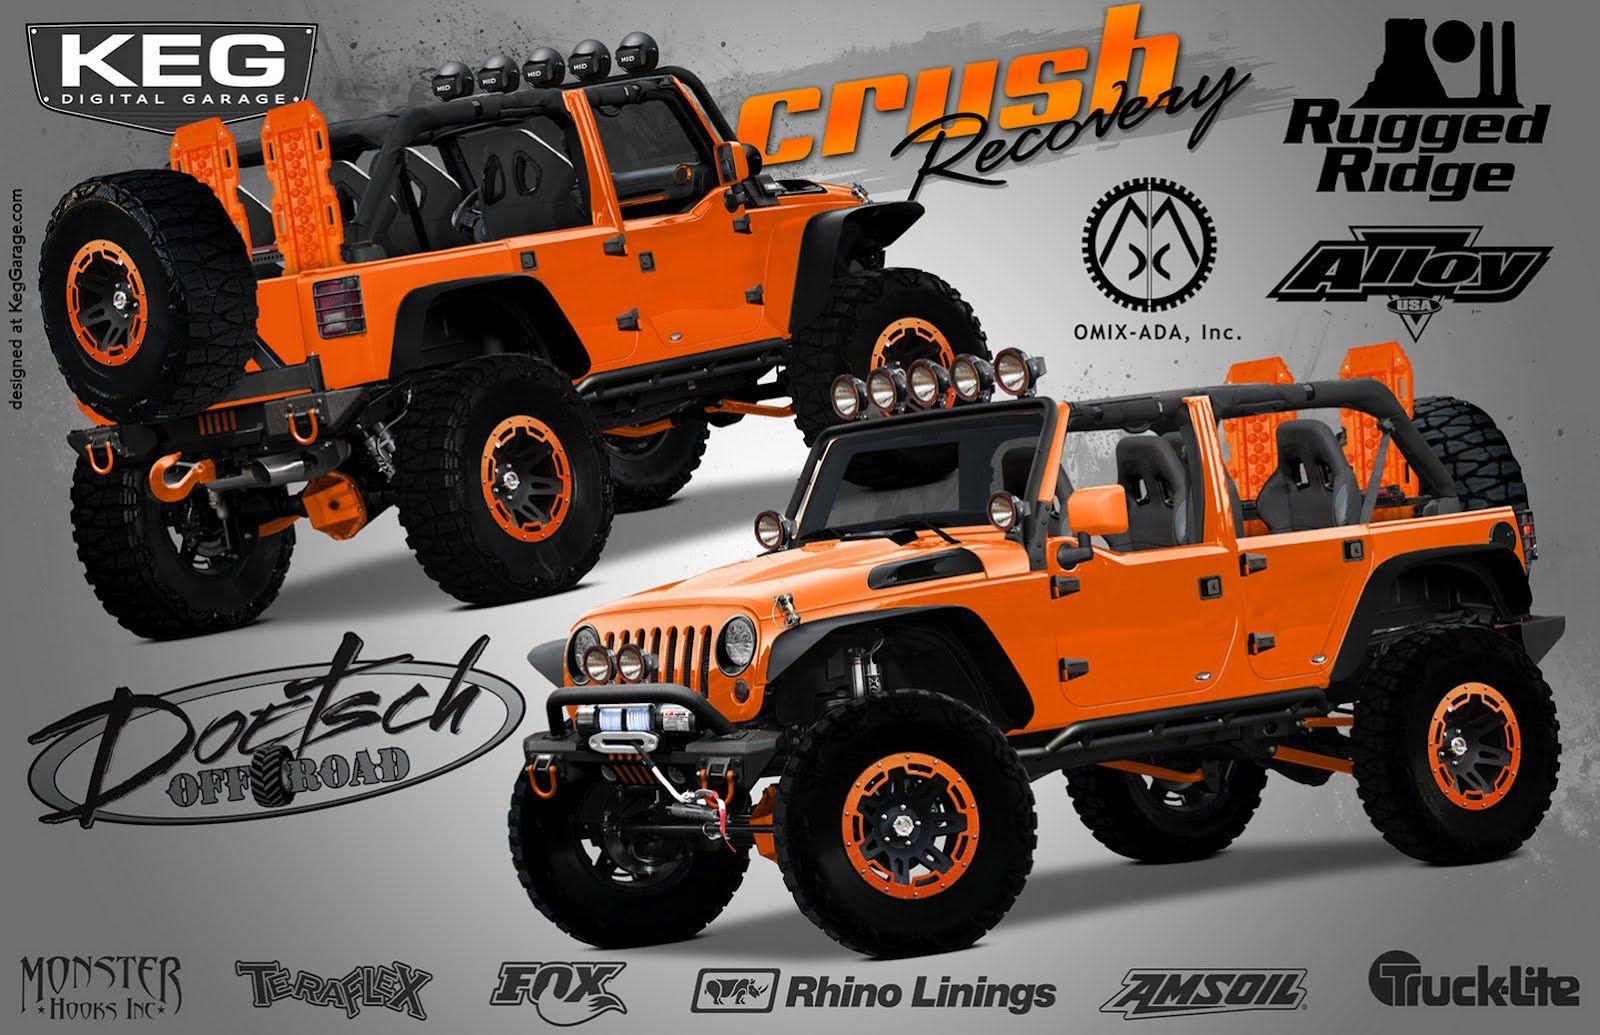 Color Me Orange Dave Doetsch S Jeep Wrangler Unlimited Crush Recovery Jeep Wrangler Unlimited 2012 Jeep Wrangler Orange Jeep